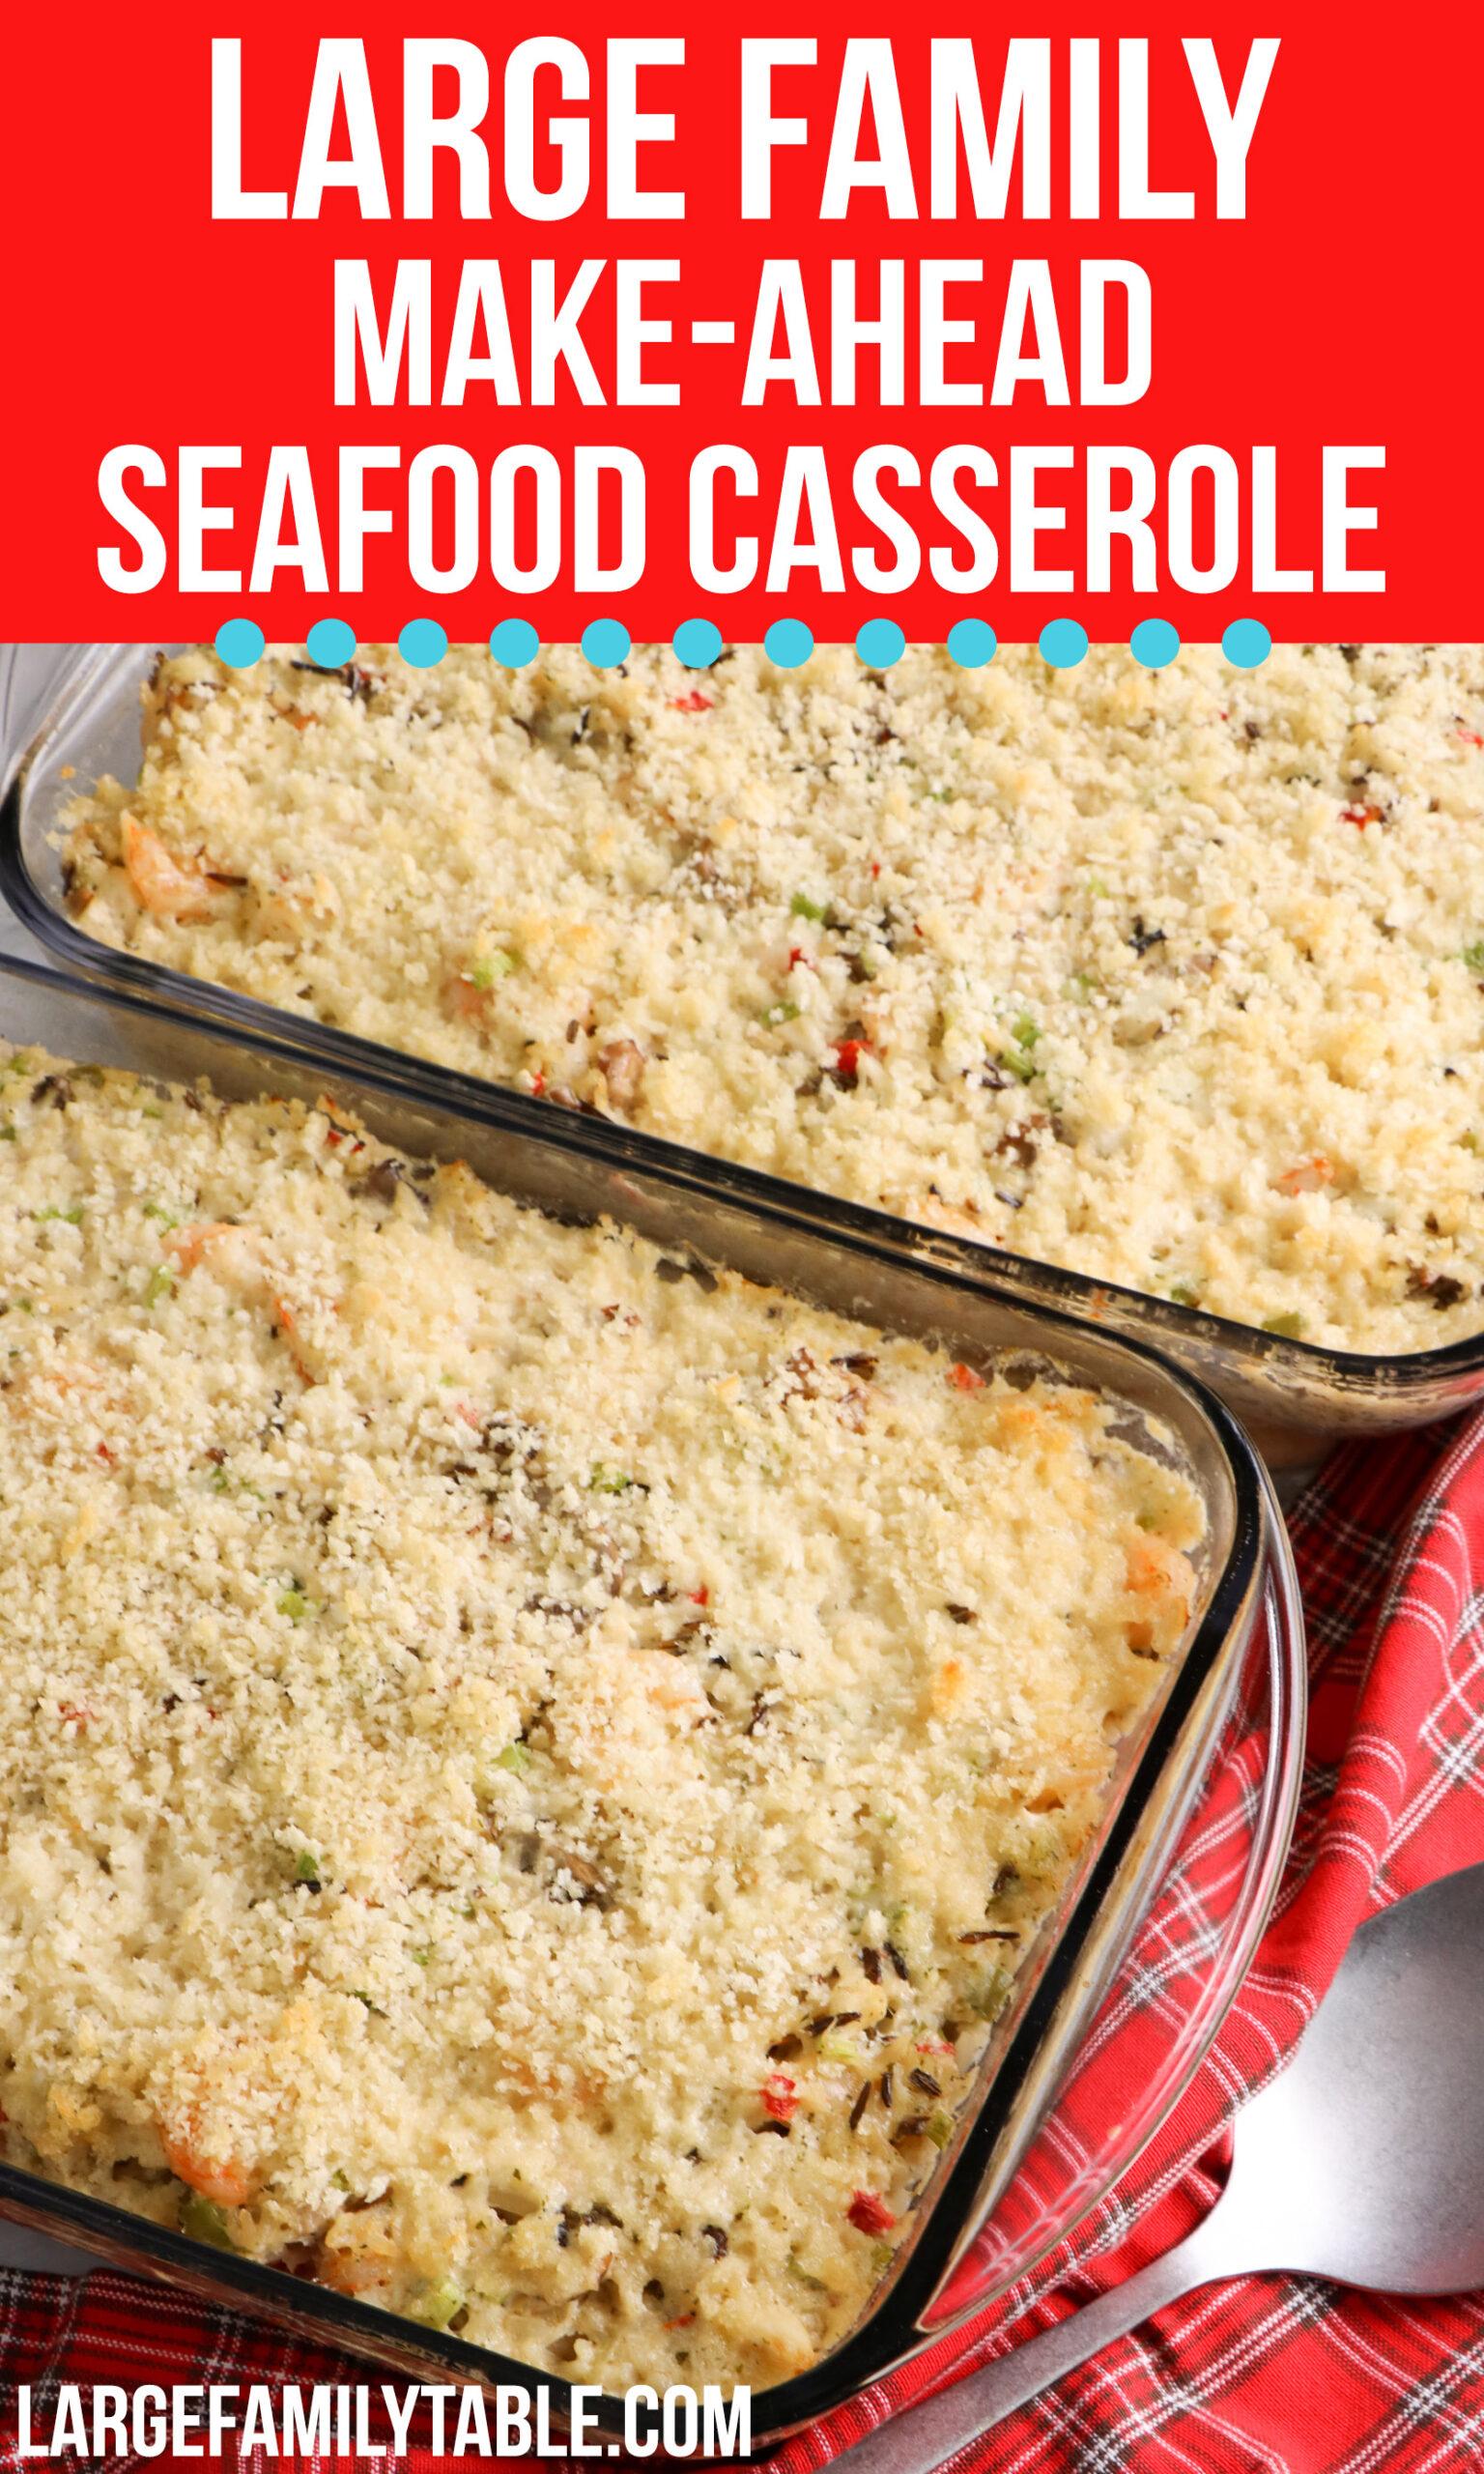 Make-Ahead Seafood Casserole